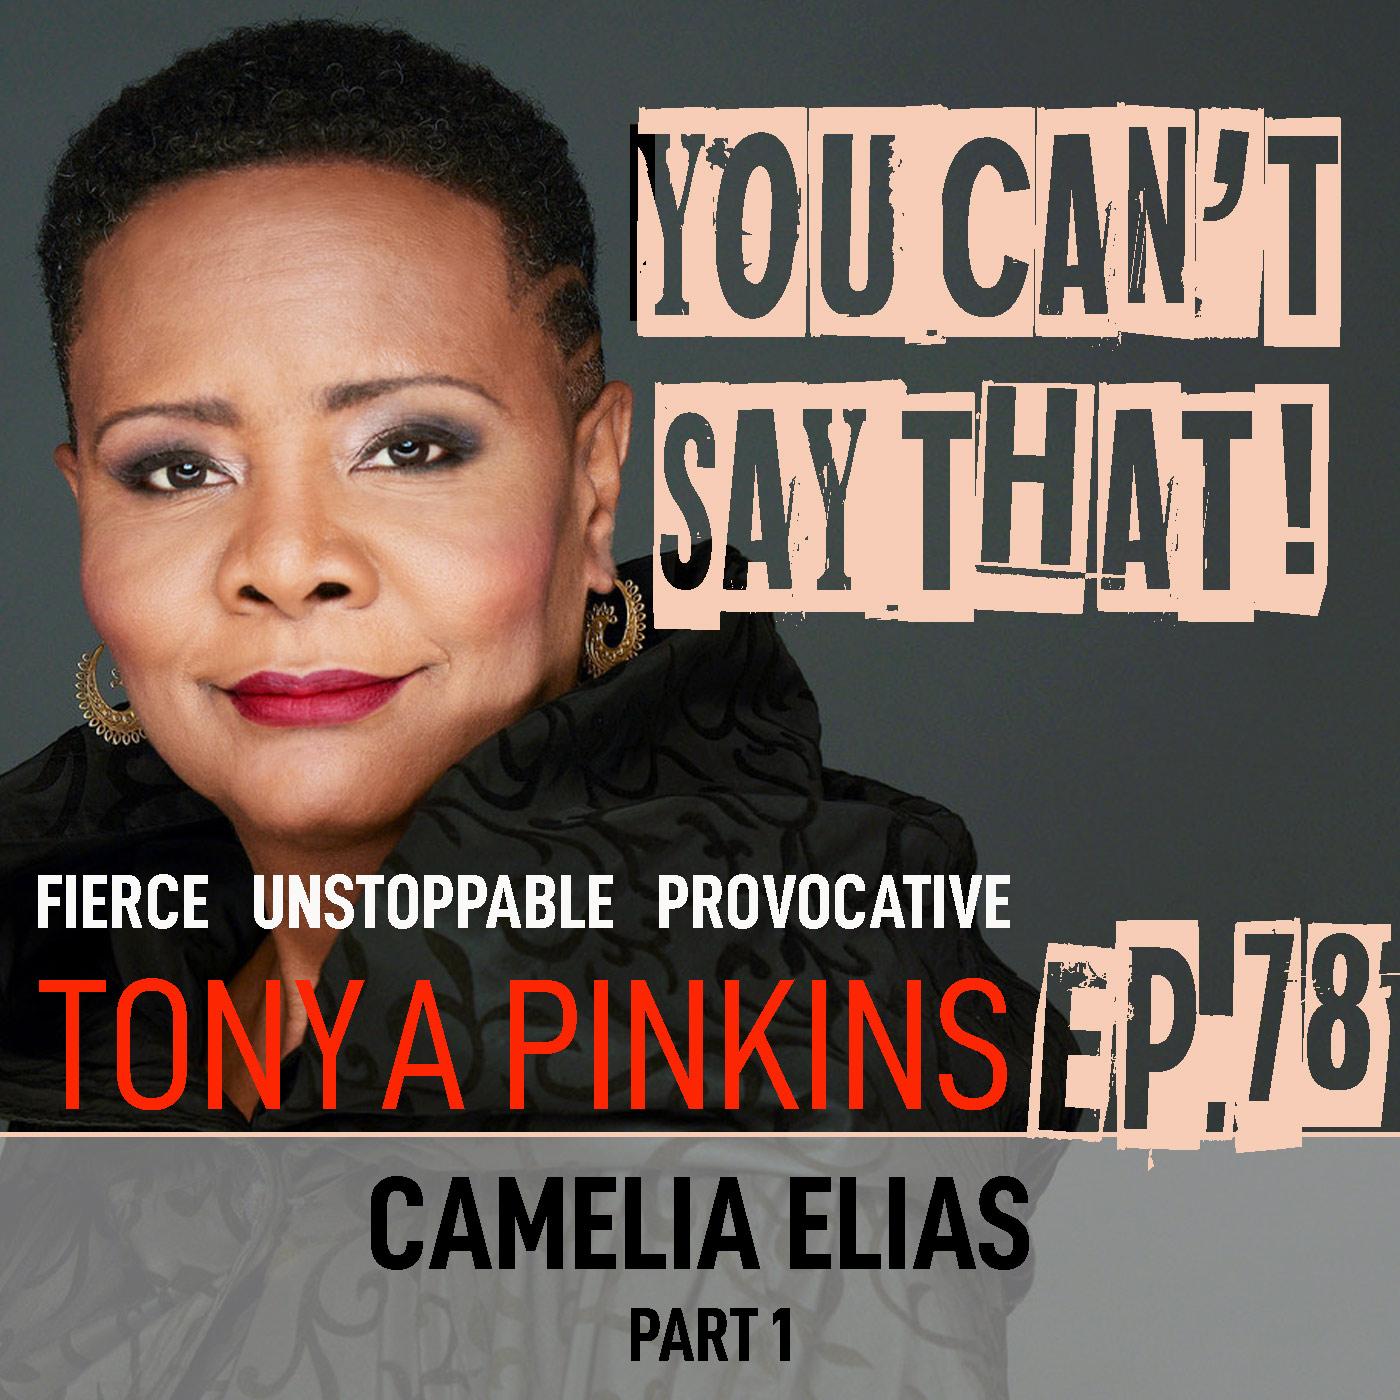 You Can't Say That Tonya Pinkins Ep78 - Camelia Elias (Part 1)